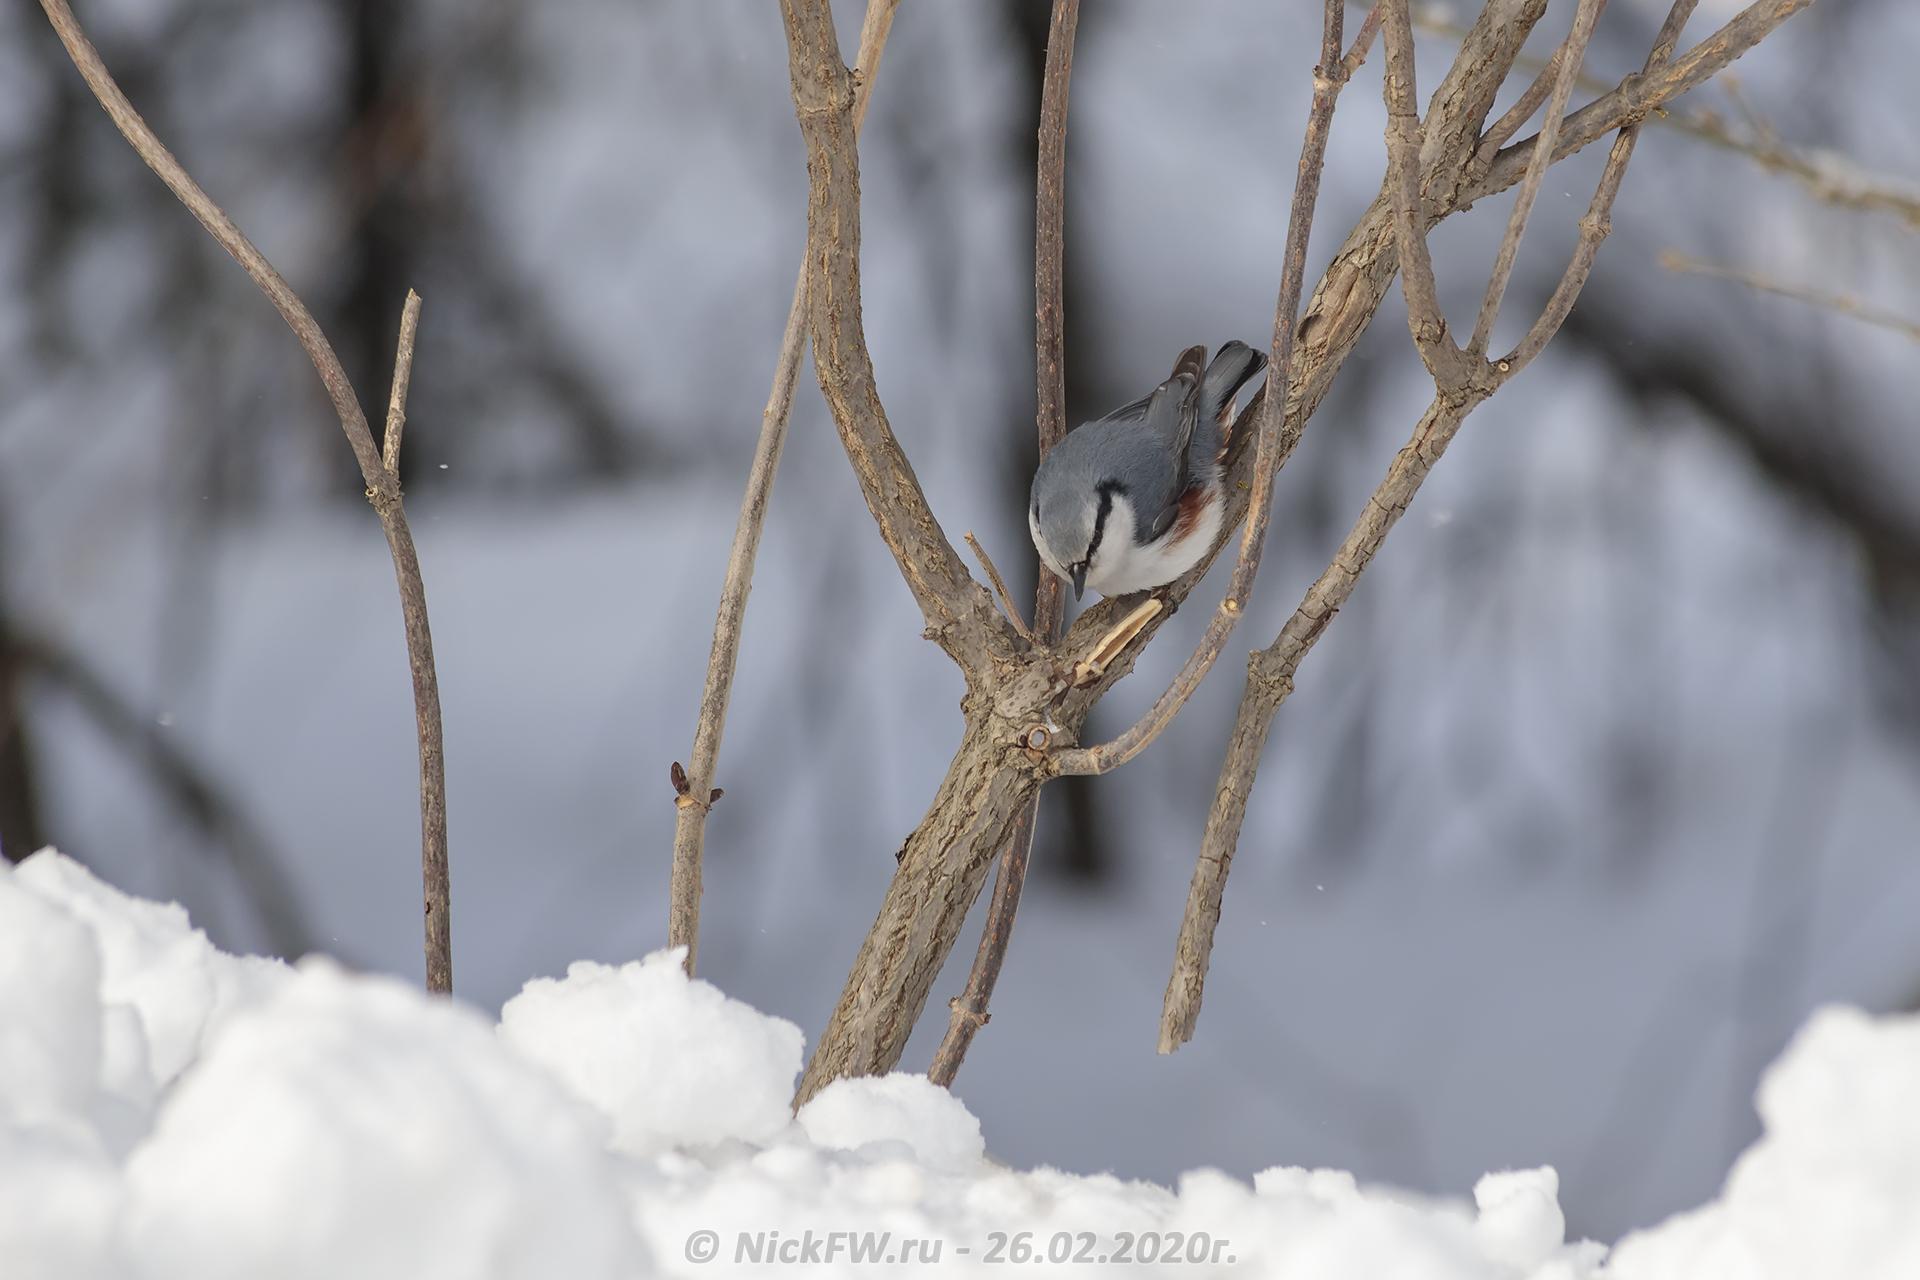 7. Поползень © NickFW.ru - 26.02.2020г.